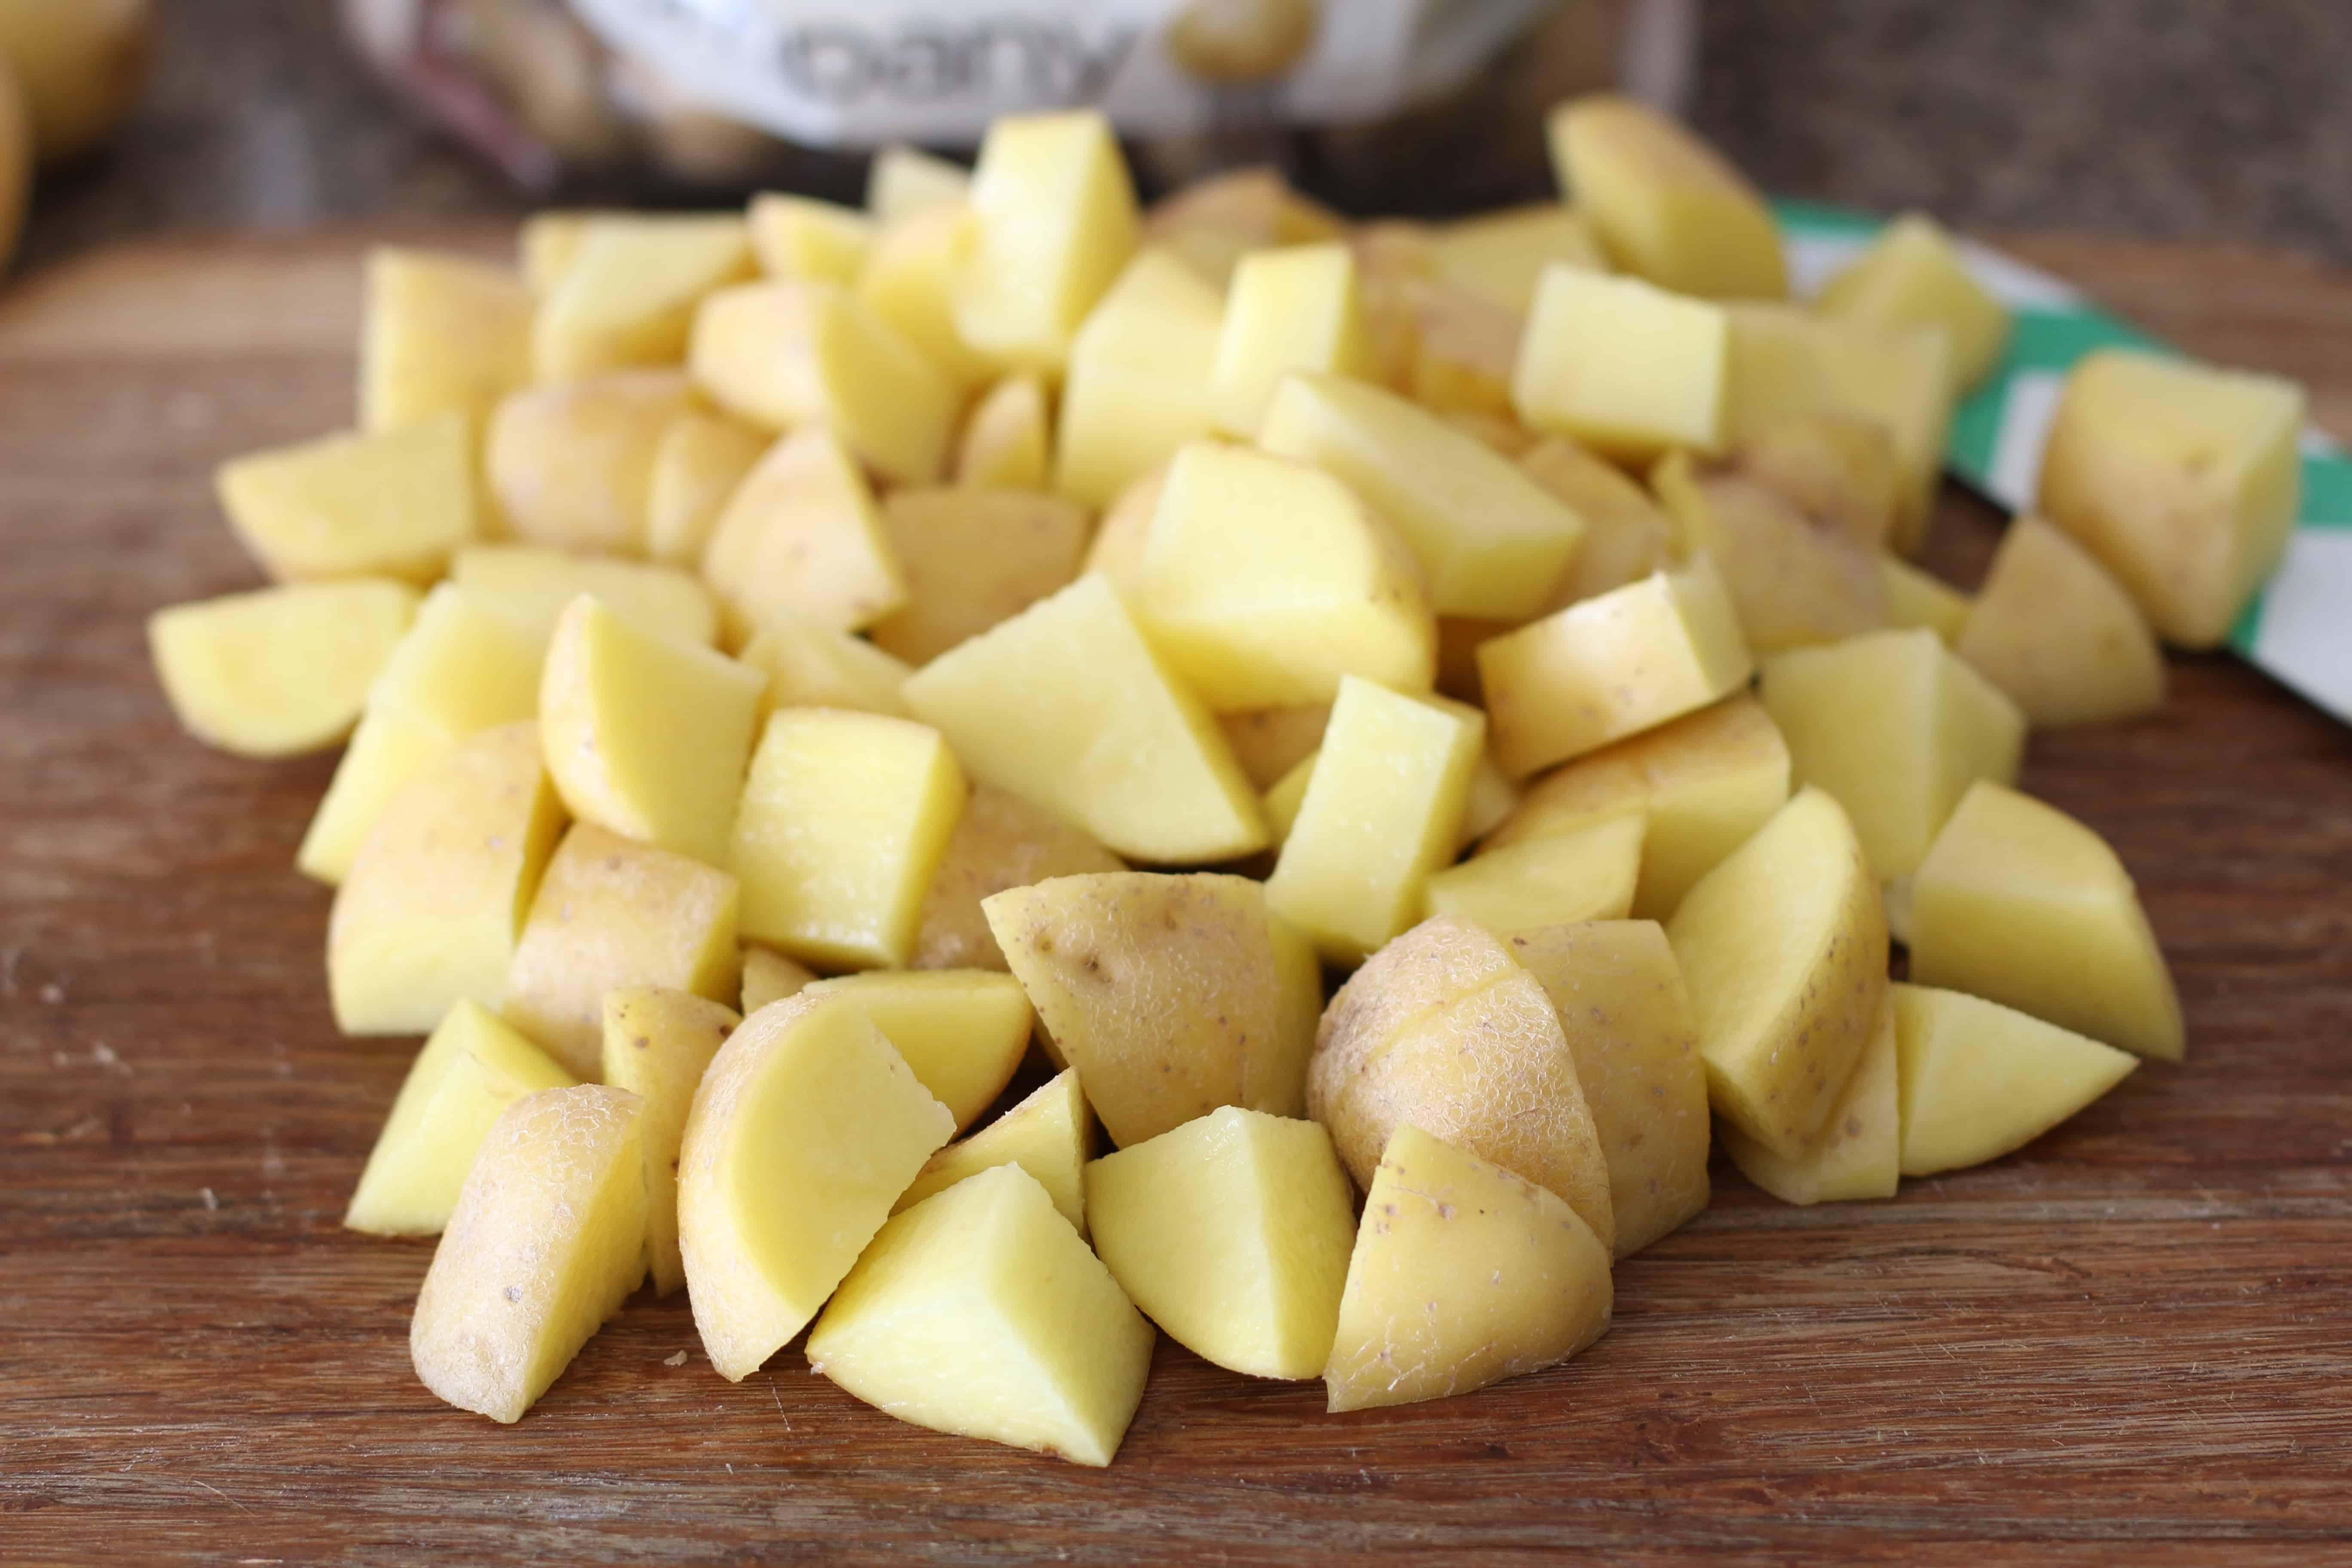 diced potatoes on a wood cutting board.